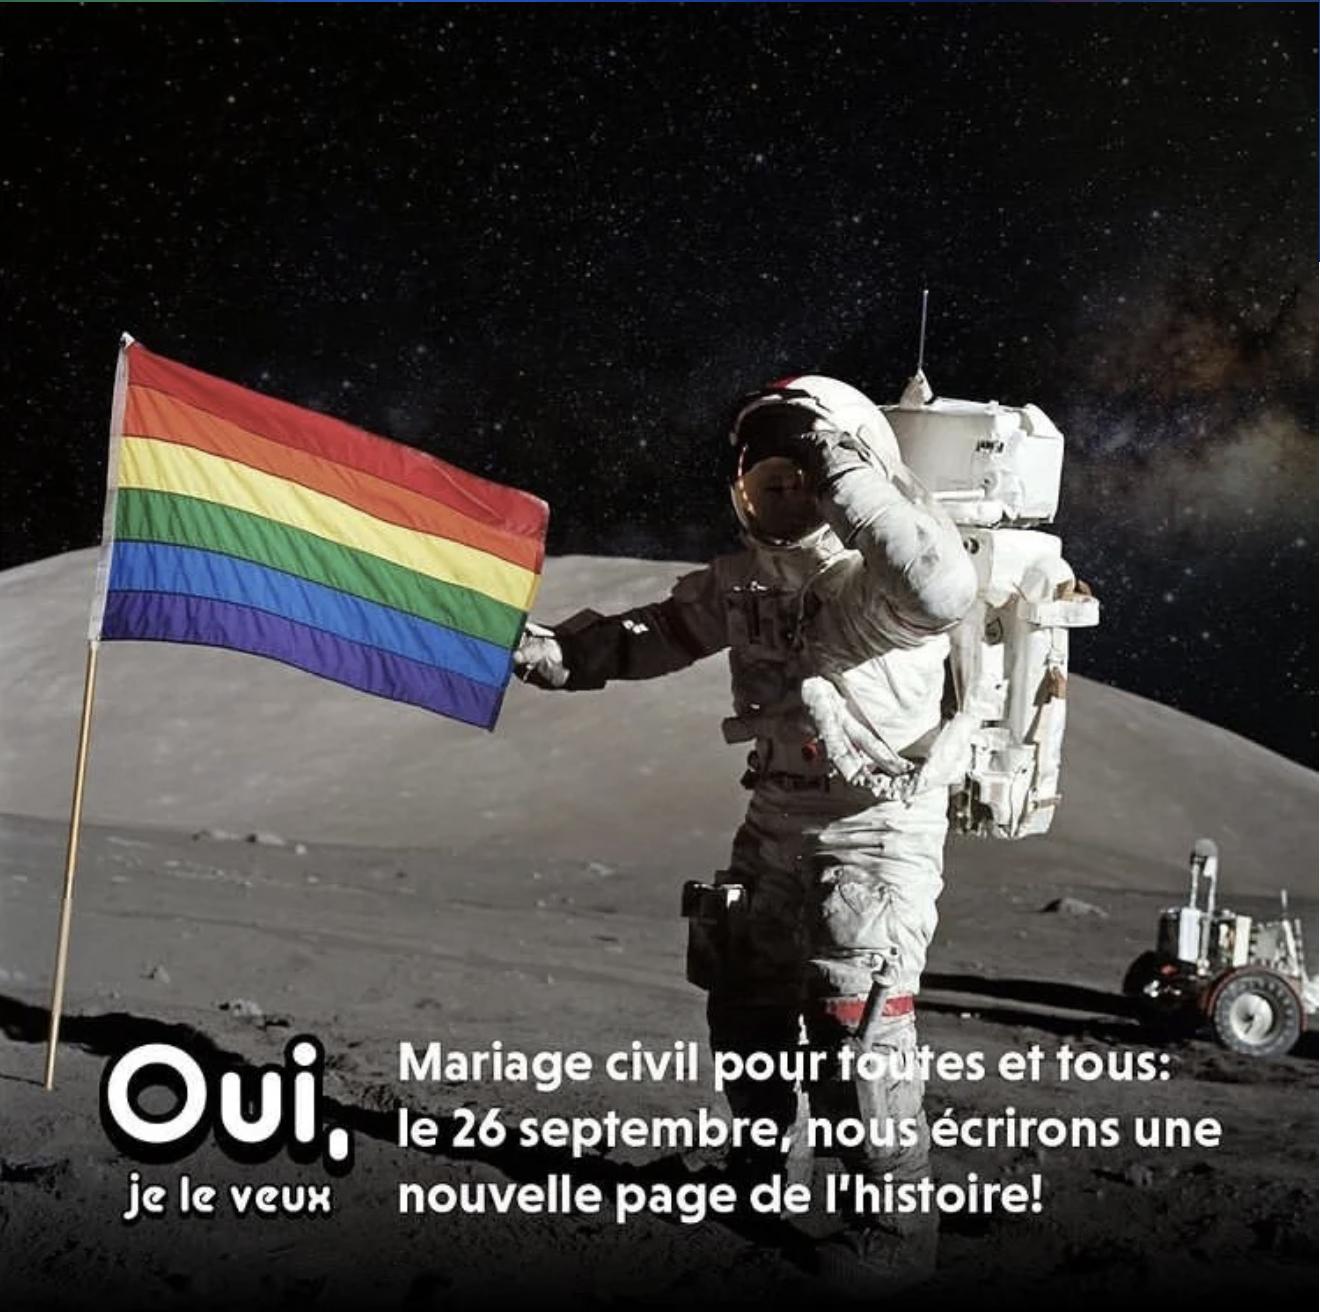 MoonshotOuiJeVeux